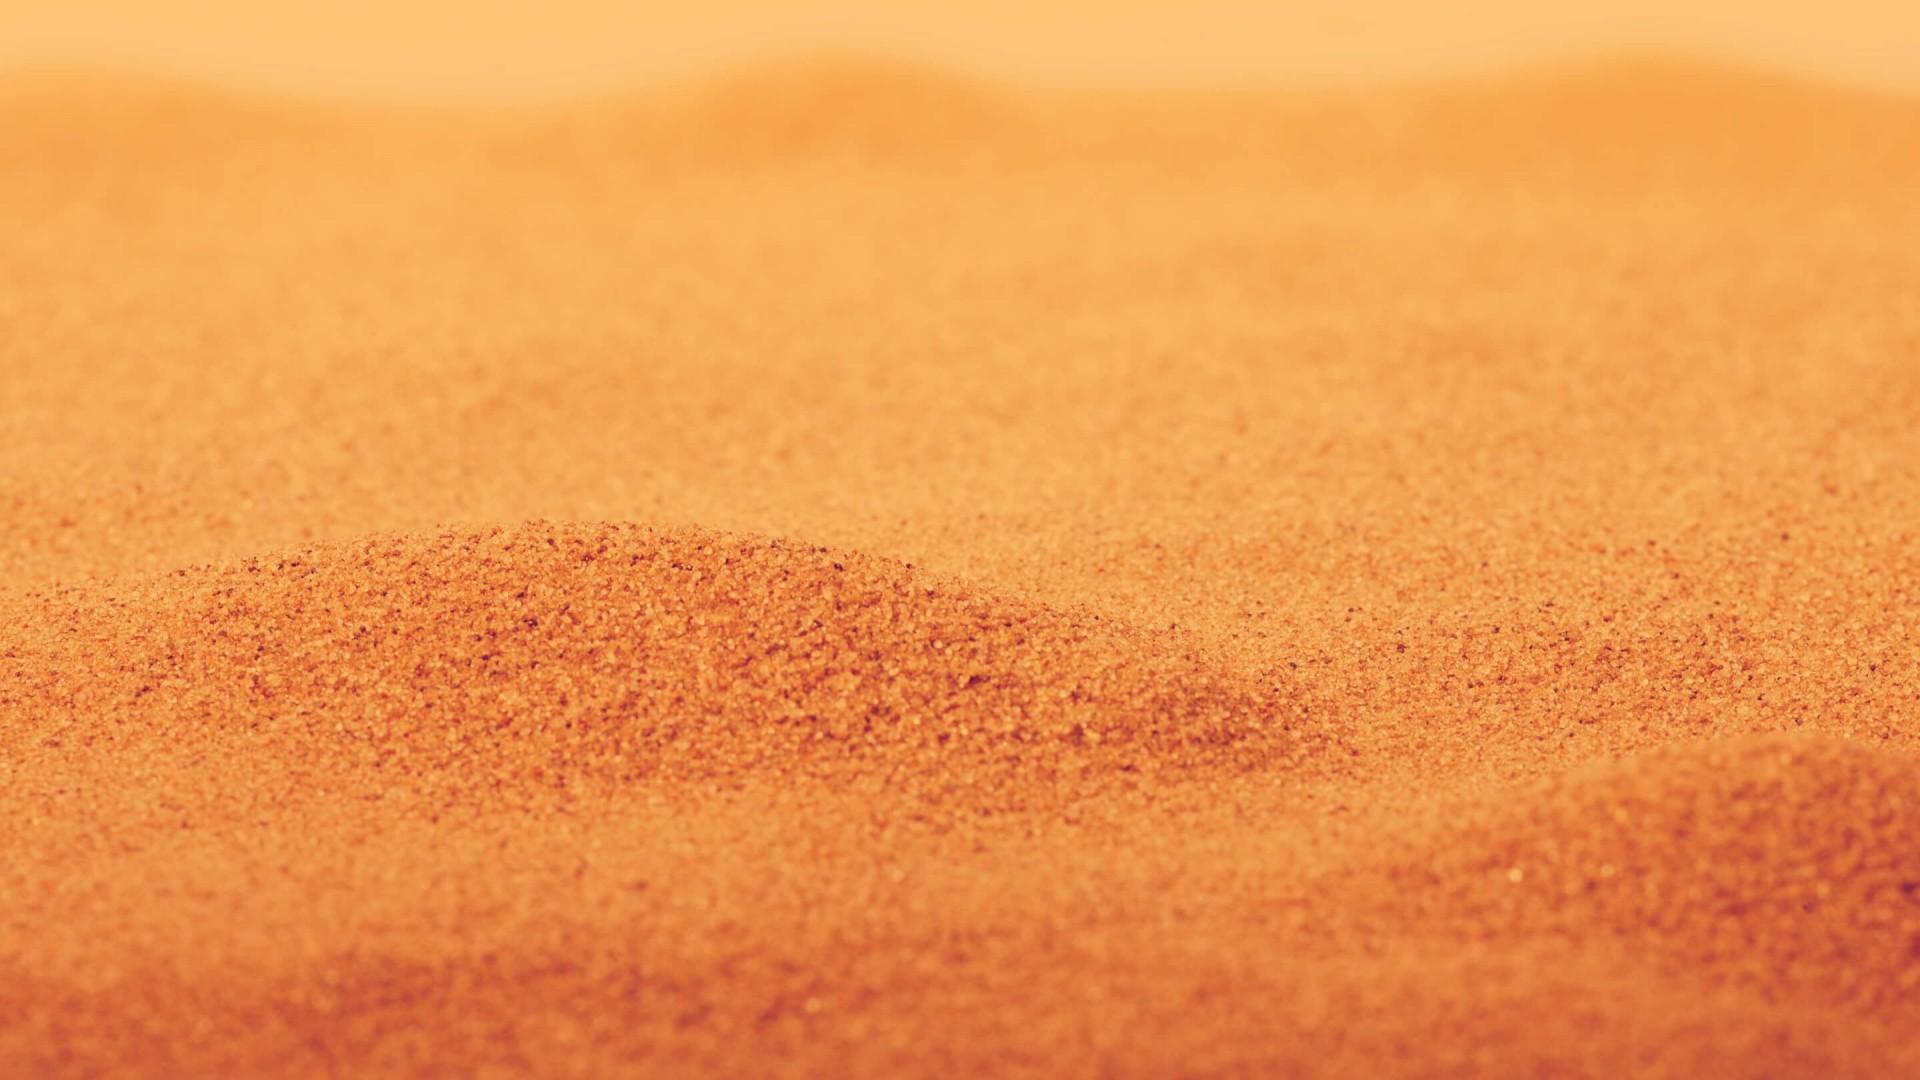 Sand Full HD Wallpaper